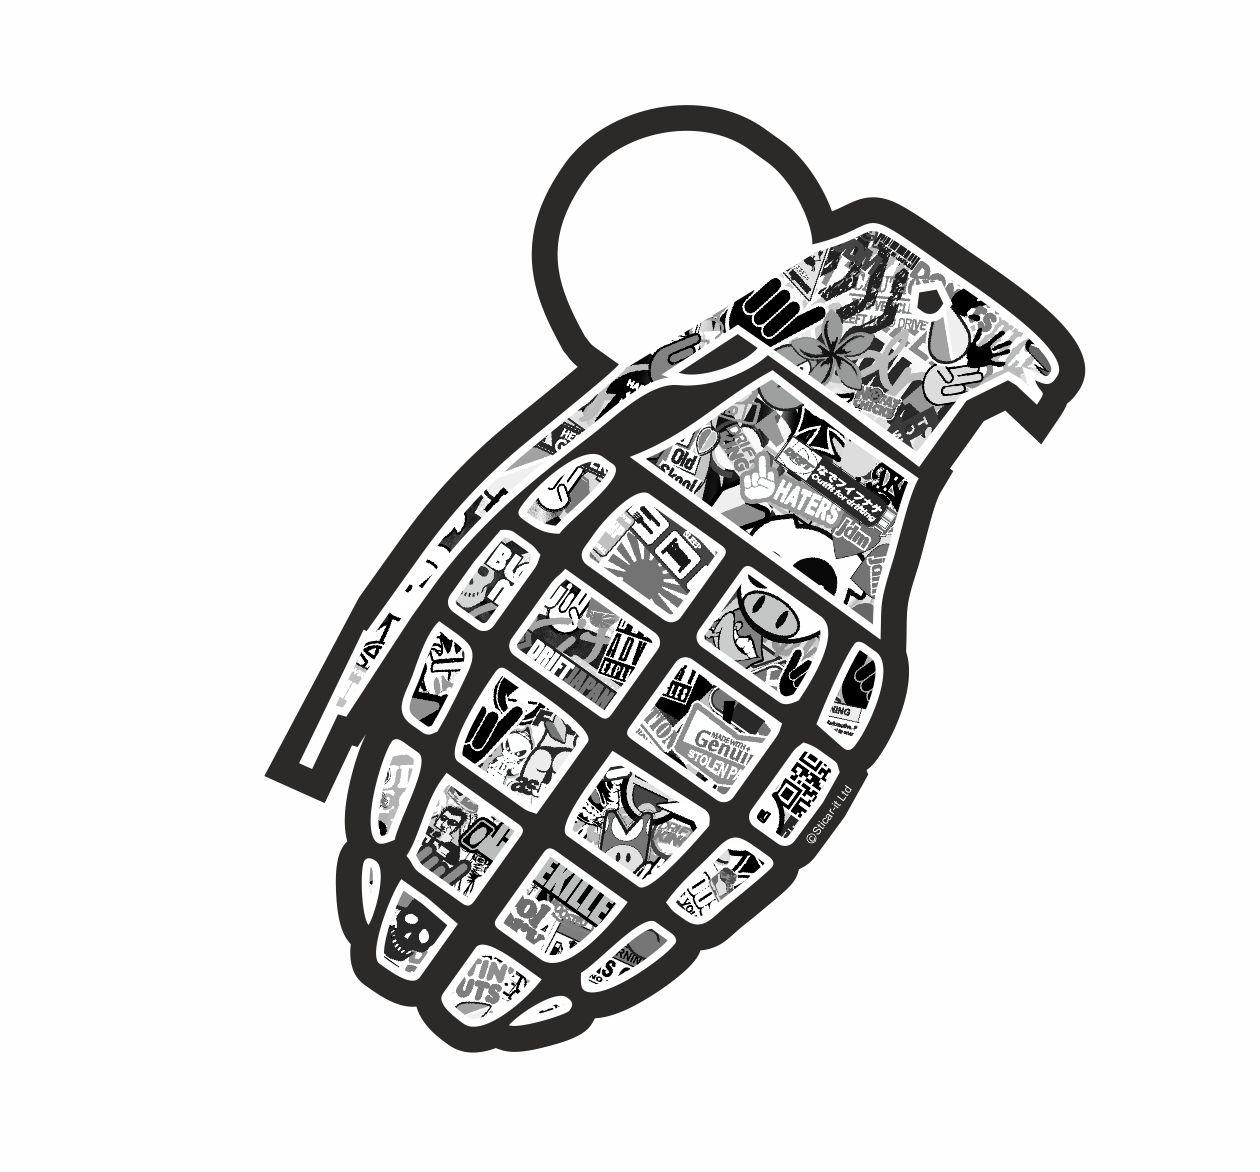 Hand Grenade With Jdm Drift Style Black Amp White